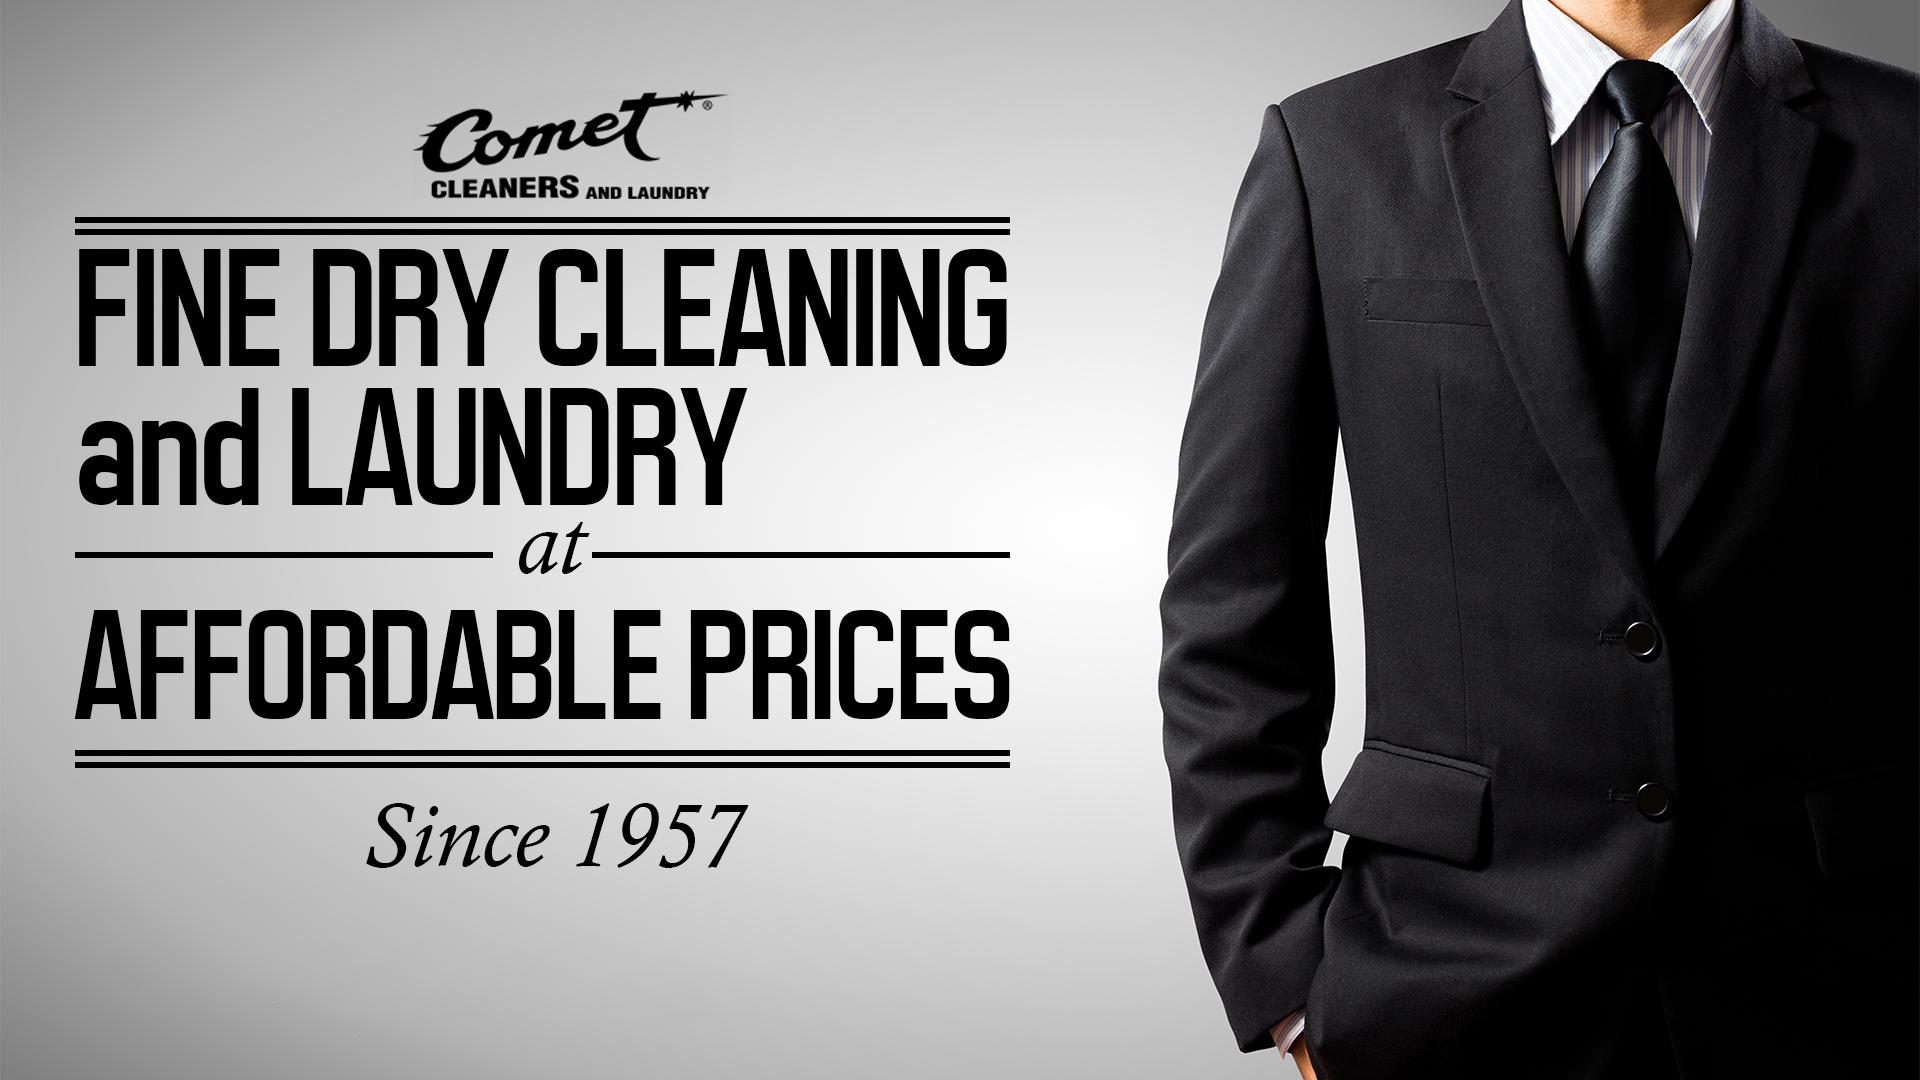 Comet Cleaners and Laundry San Antonio image 0